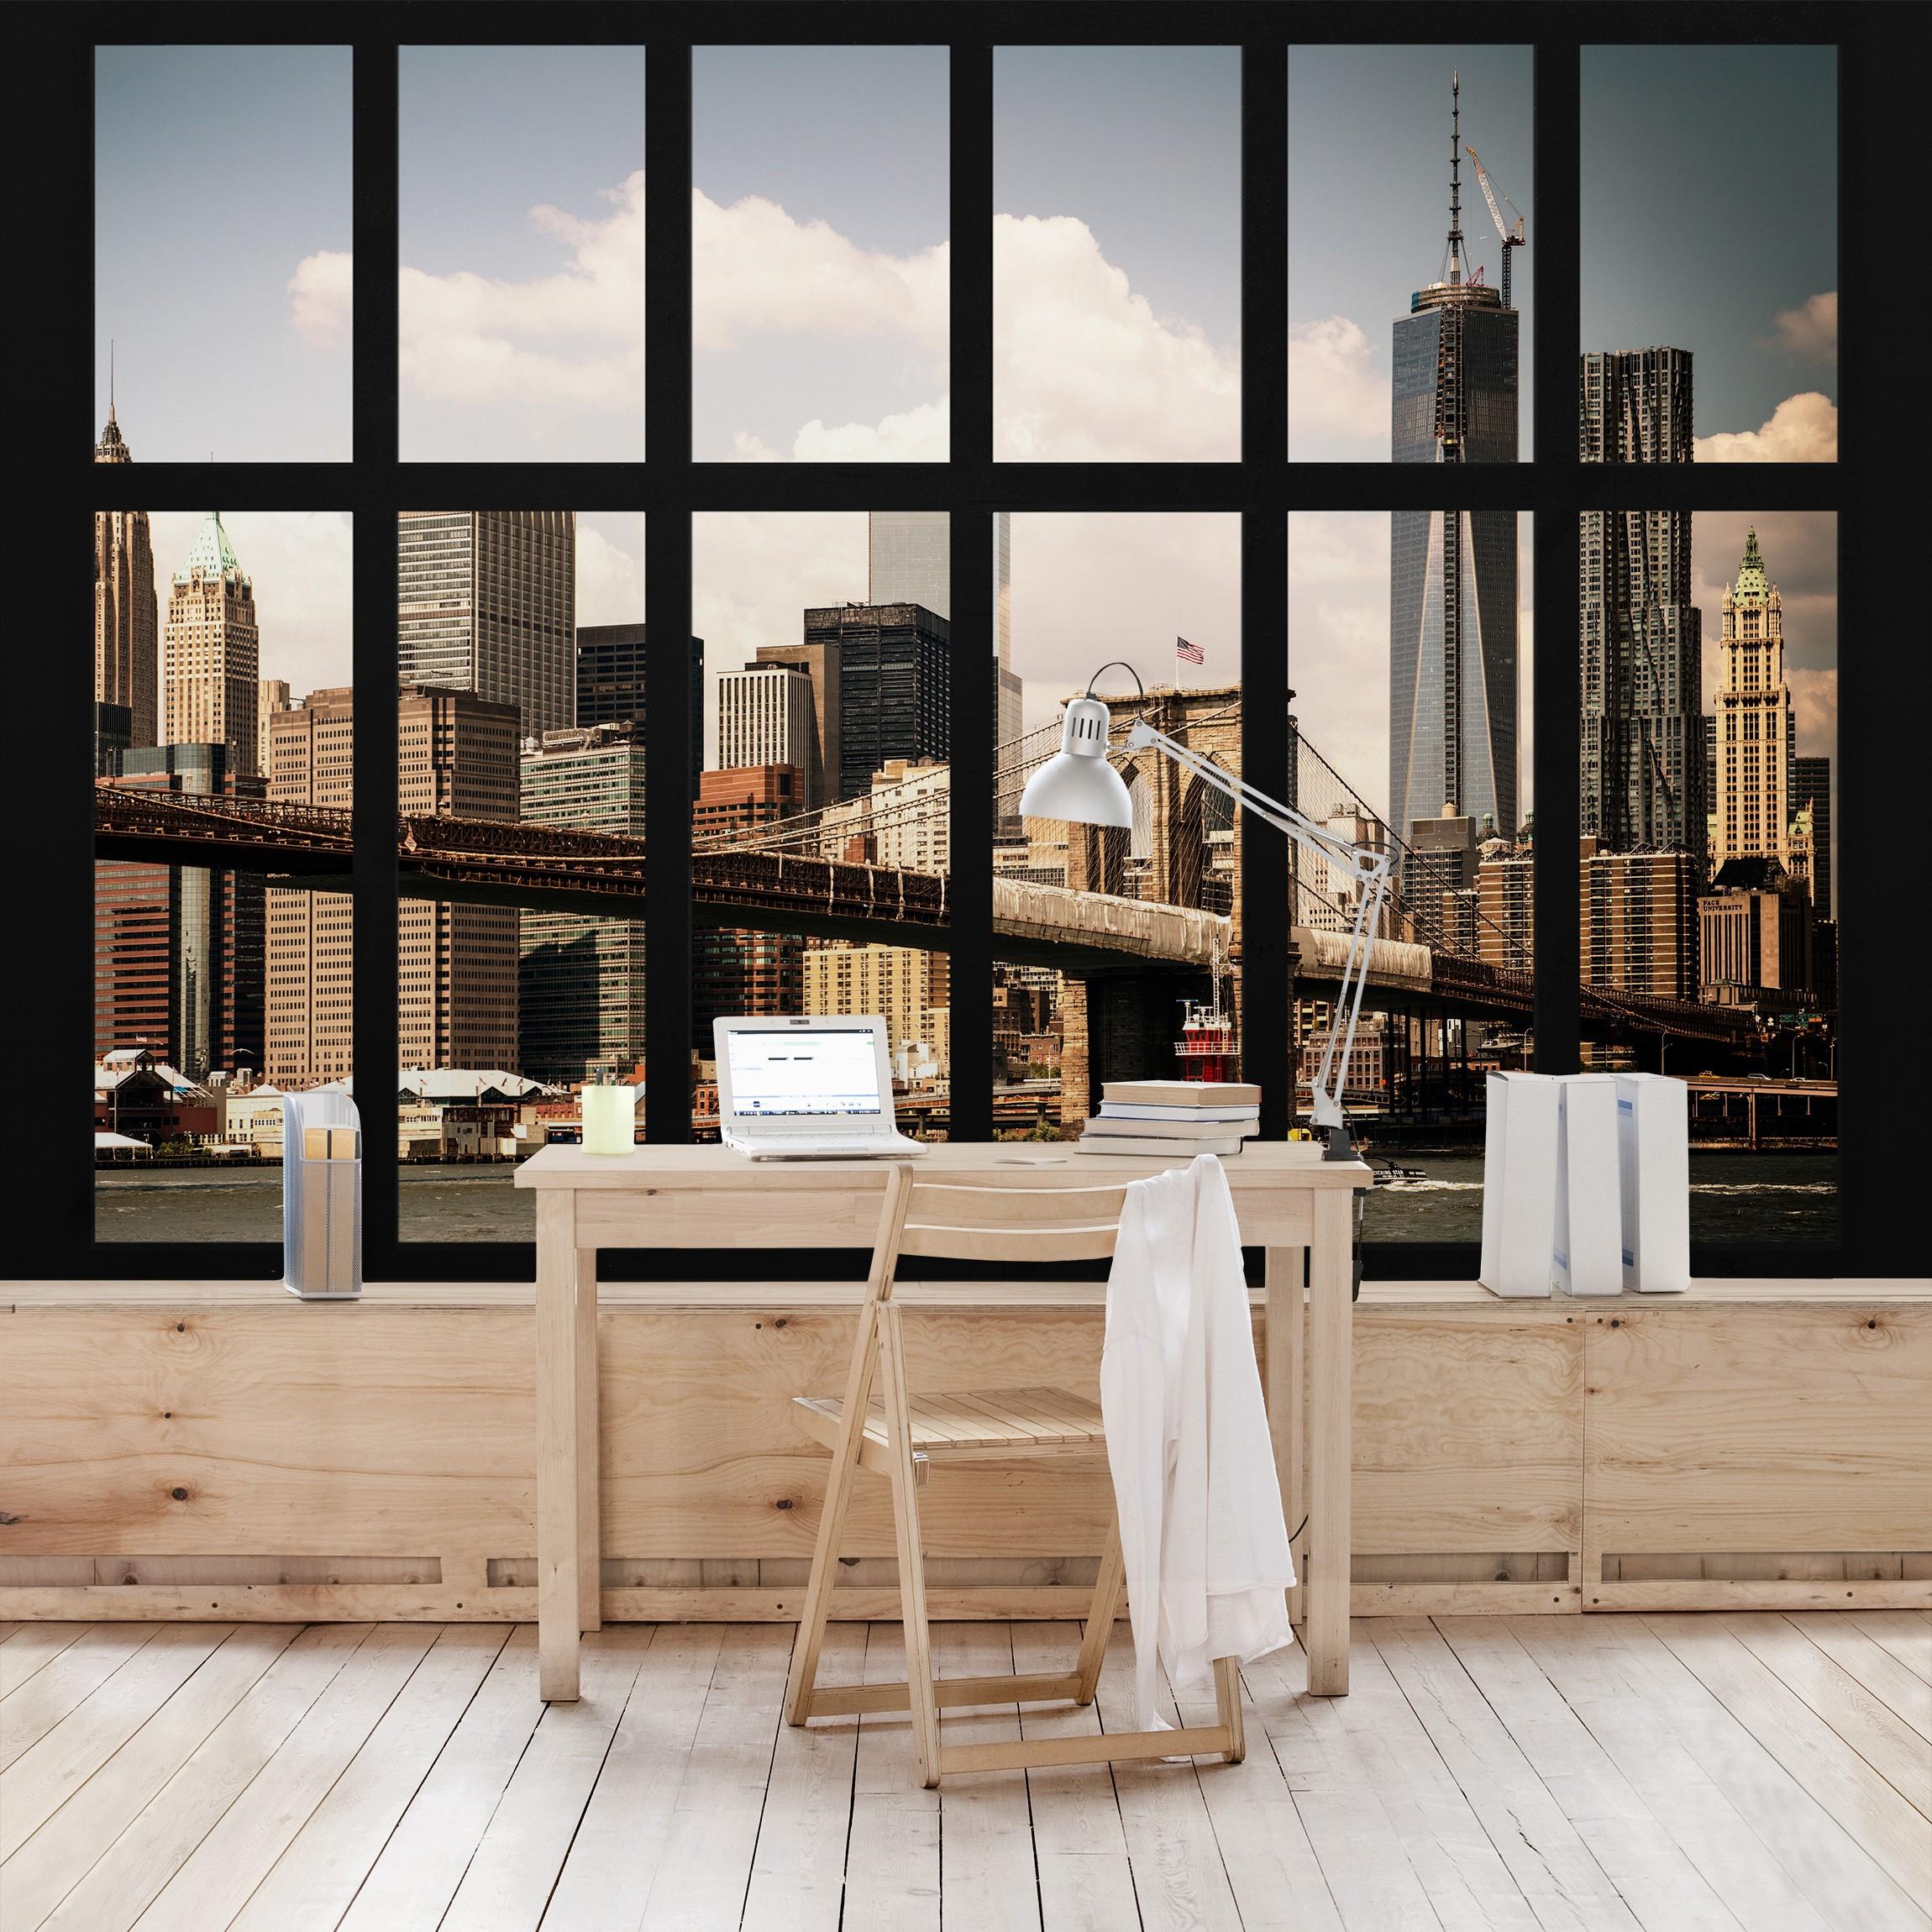 new york fototapete selbstklebend fenster new york brooklyn bridge. Black Bedroom Furniture Sets. Home Design Ideas